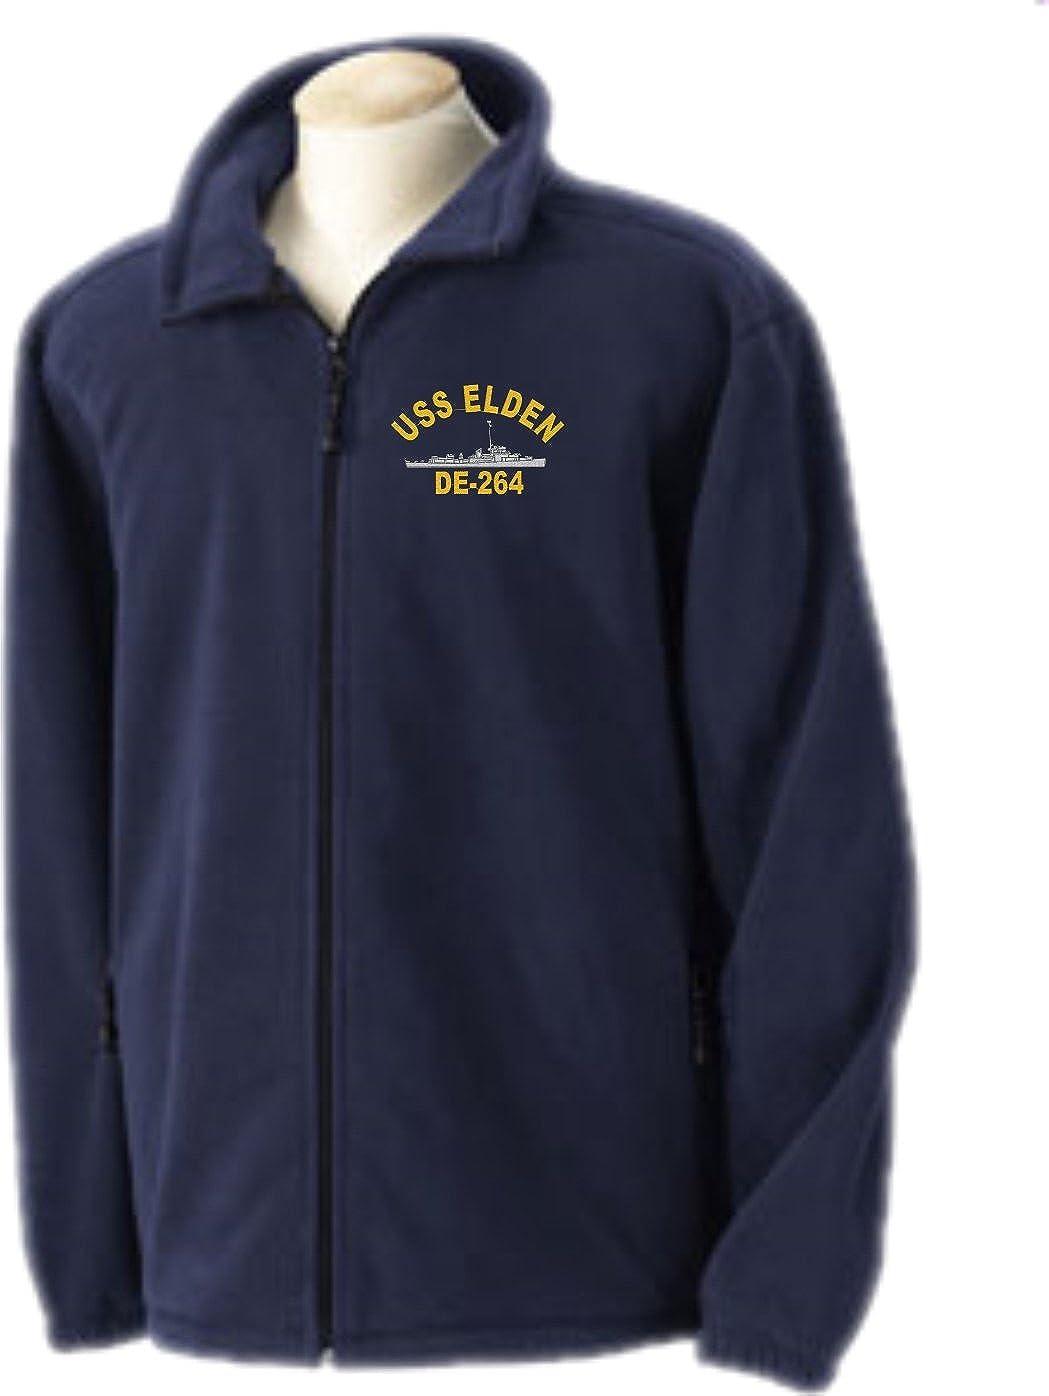 Custom Military Apparel USS Elden DE-264 Embroidered Fleece Jacket Sizes SMALL-4X